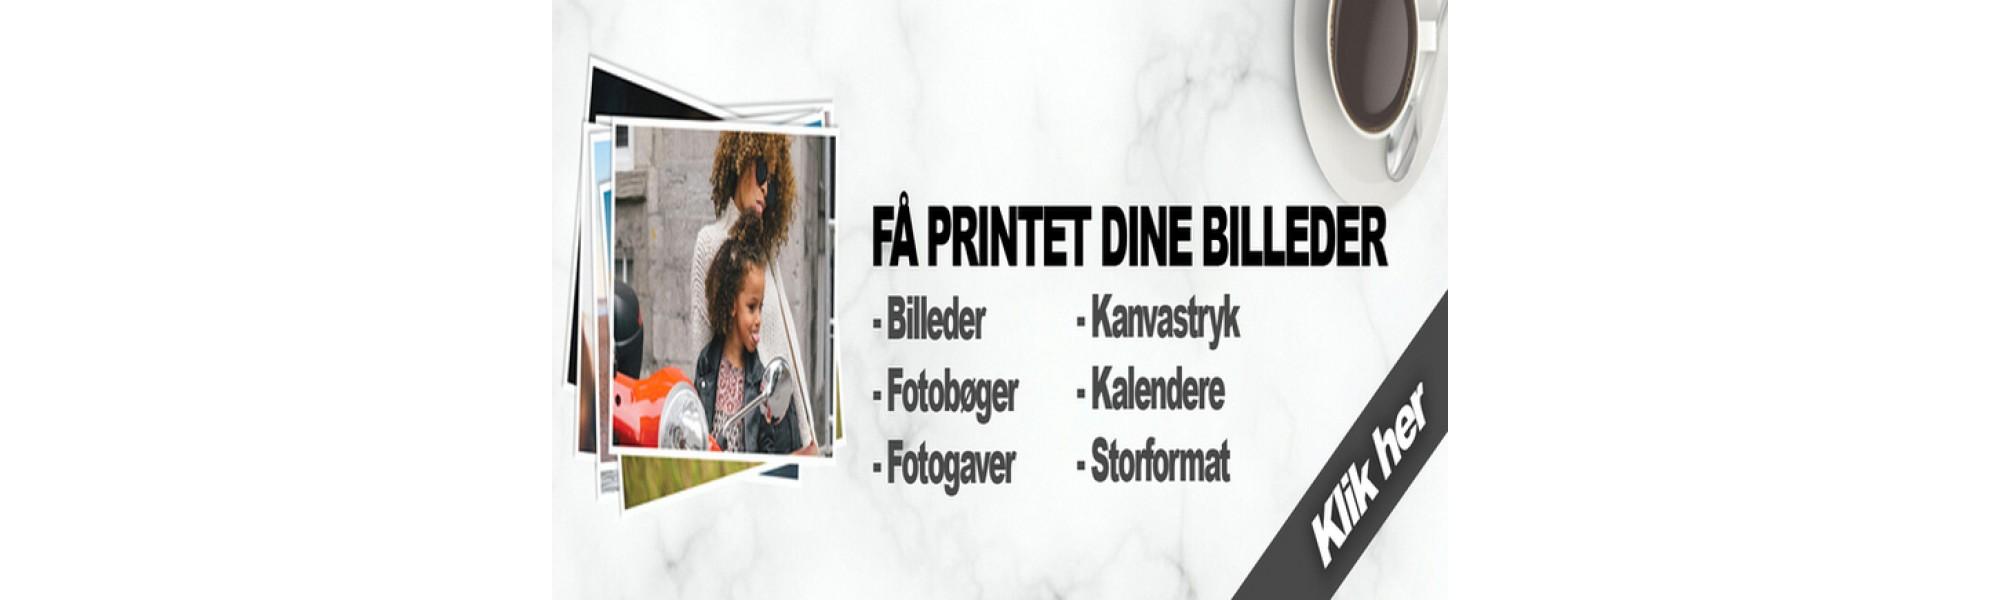 Print billeder